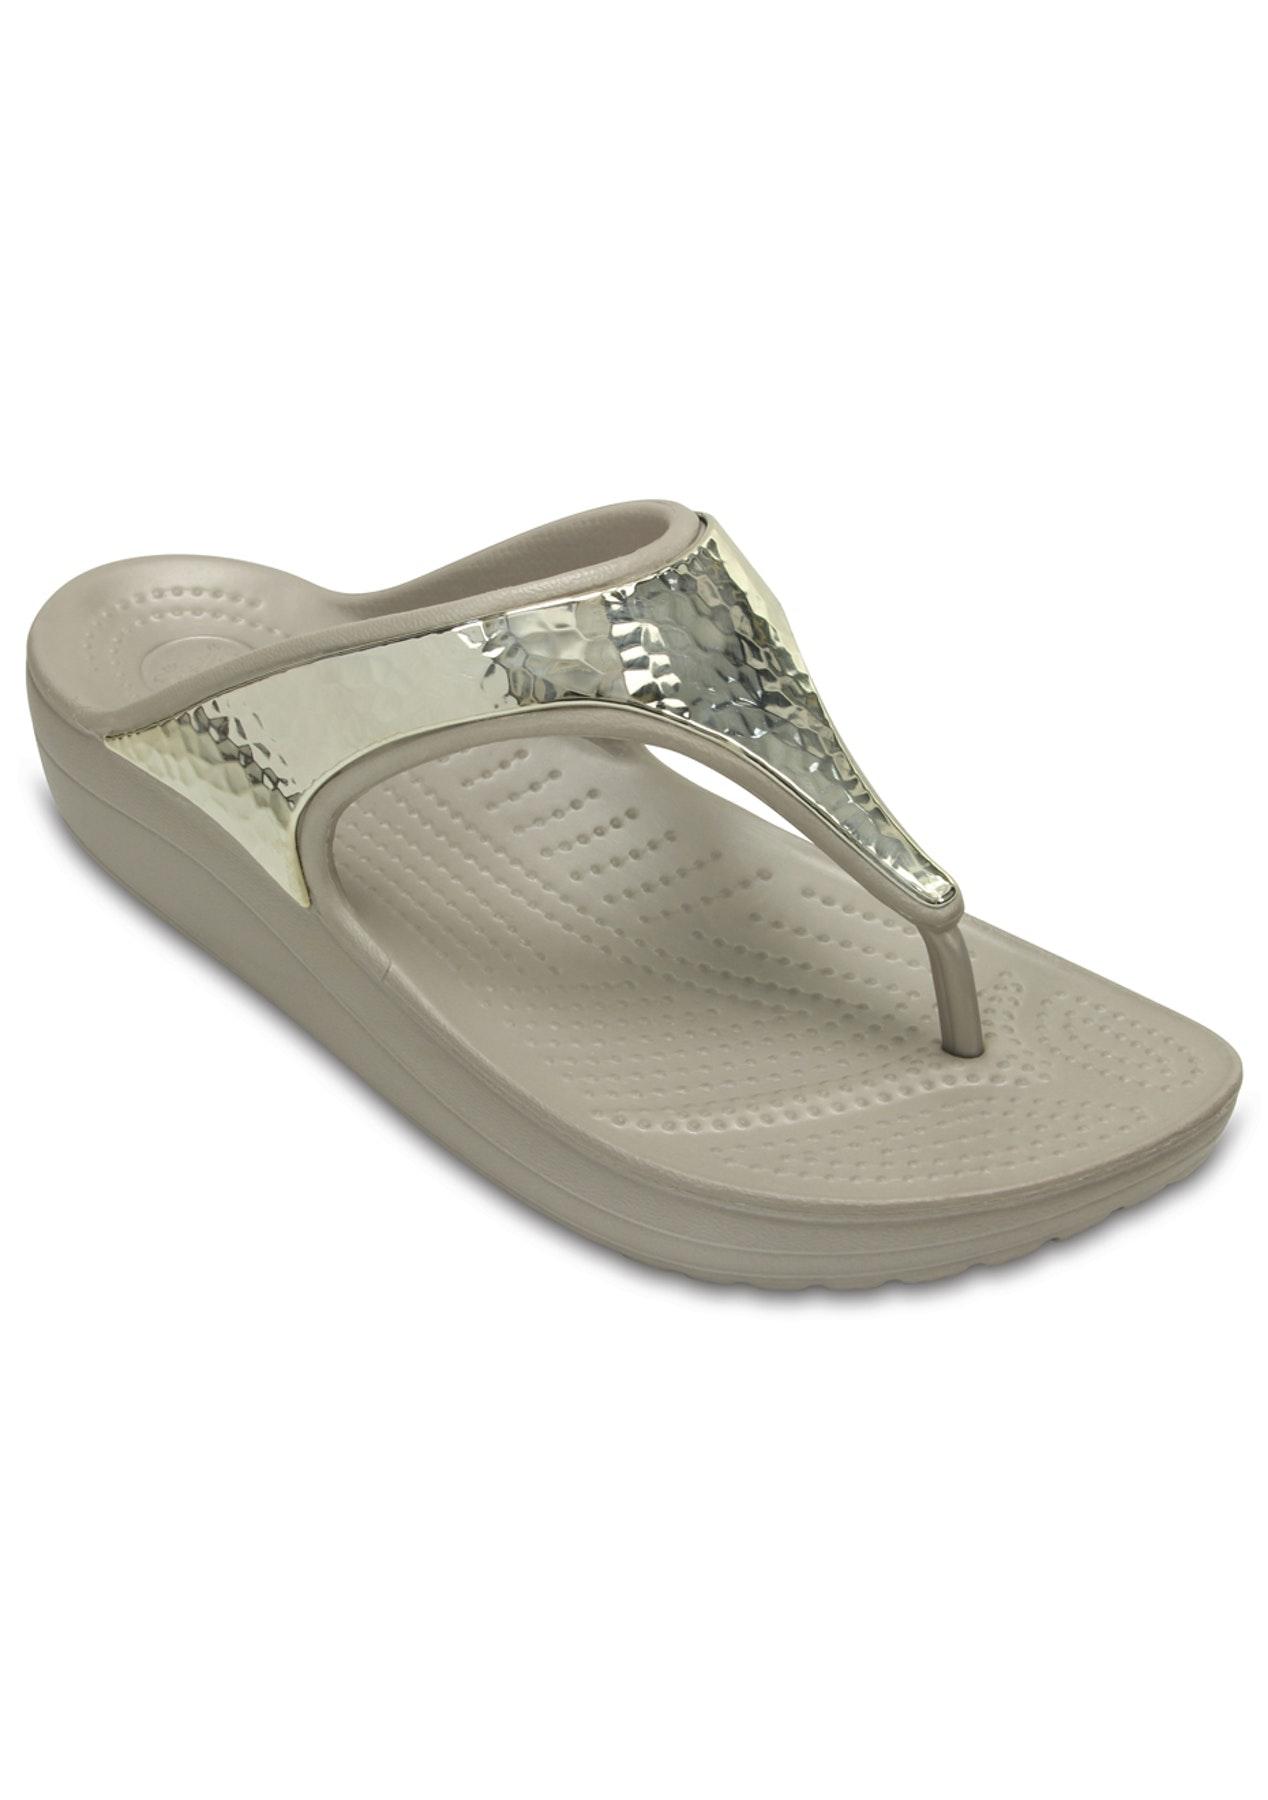 e19e01411c39 CROCS - Women s CROCS Sloane Embellished Flip - Platinum Platinum - CROCS  up to 50% Off - Onceit